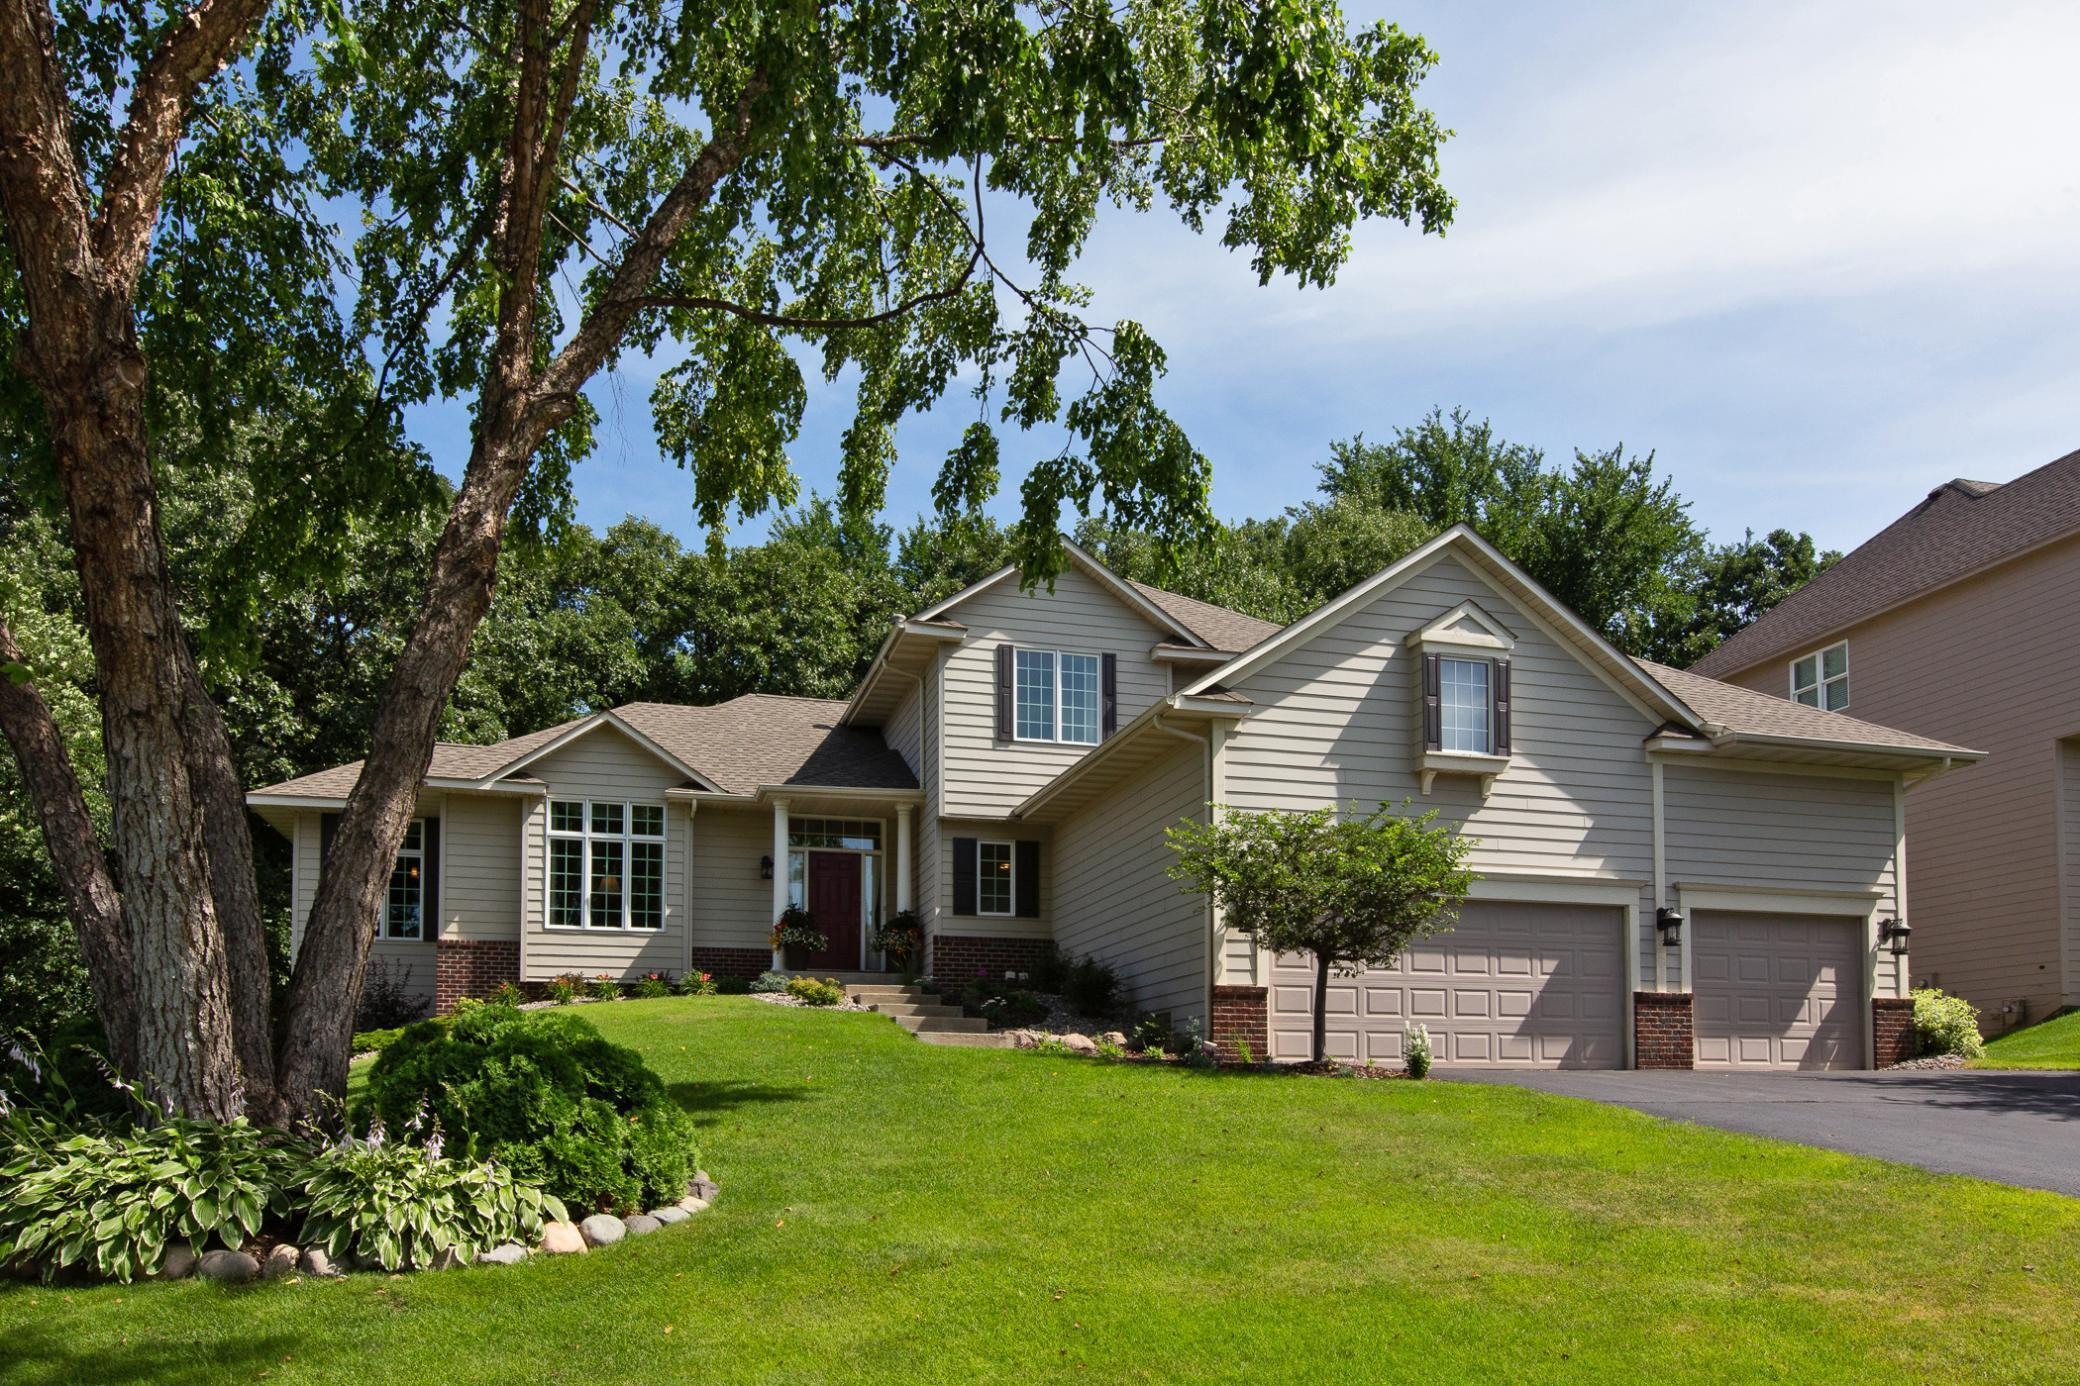 553 77th Street W Property Photo - Eagan, MN real estate listing